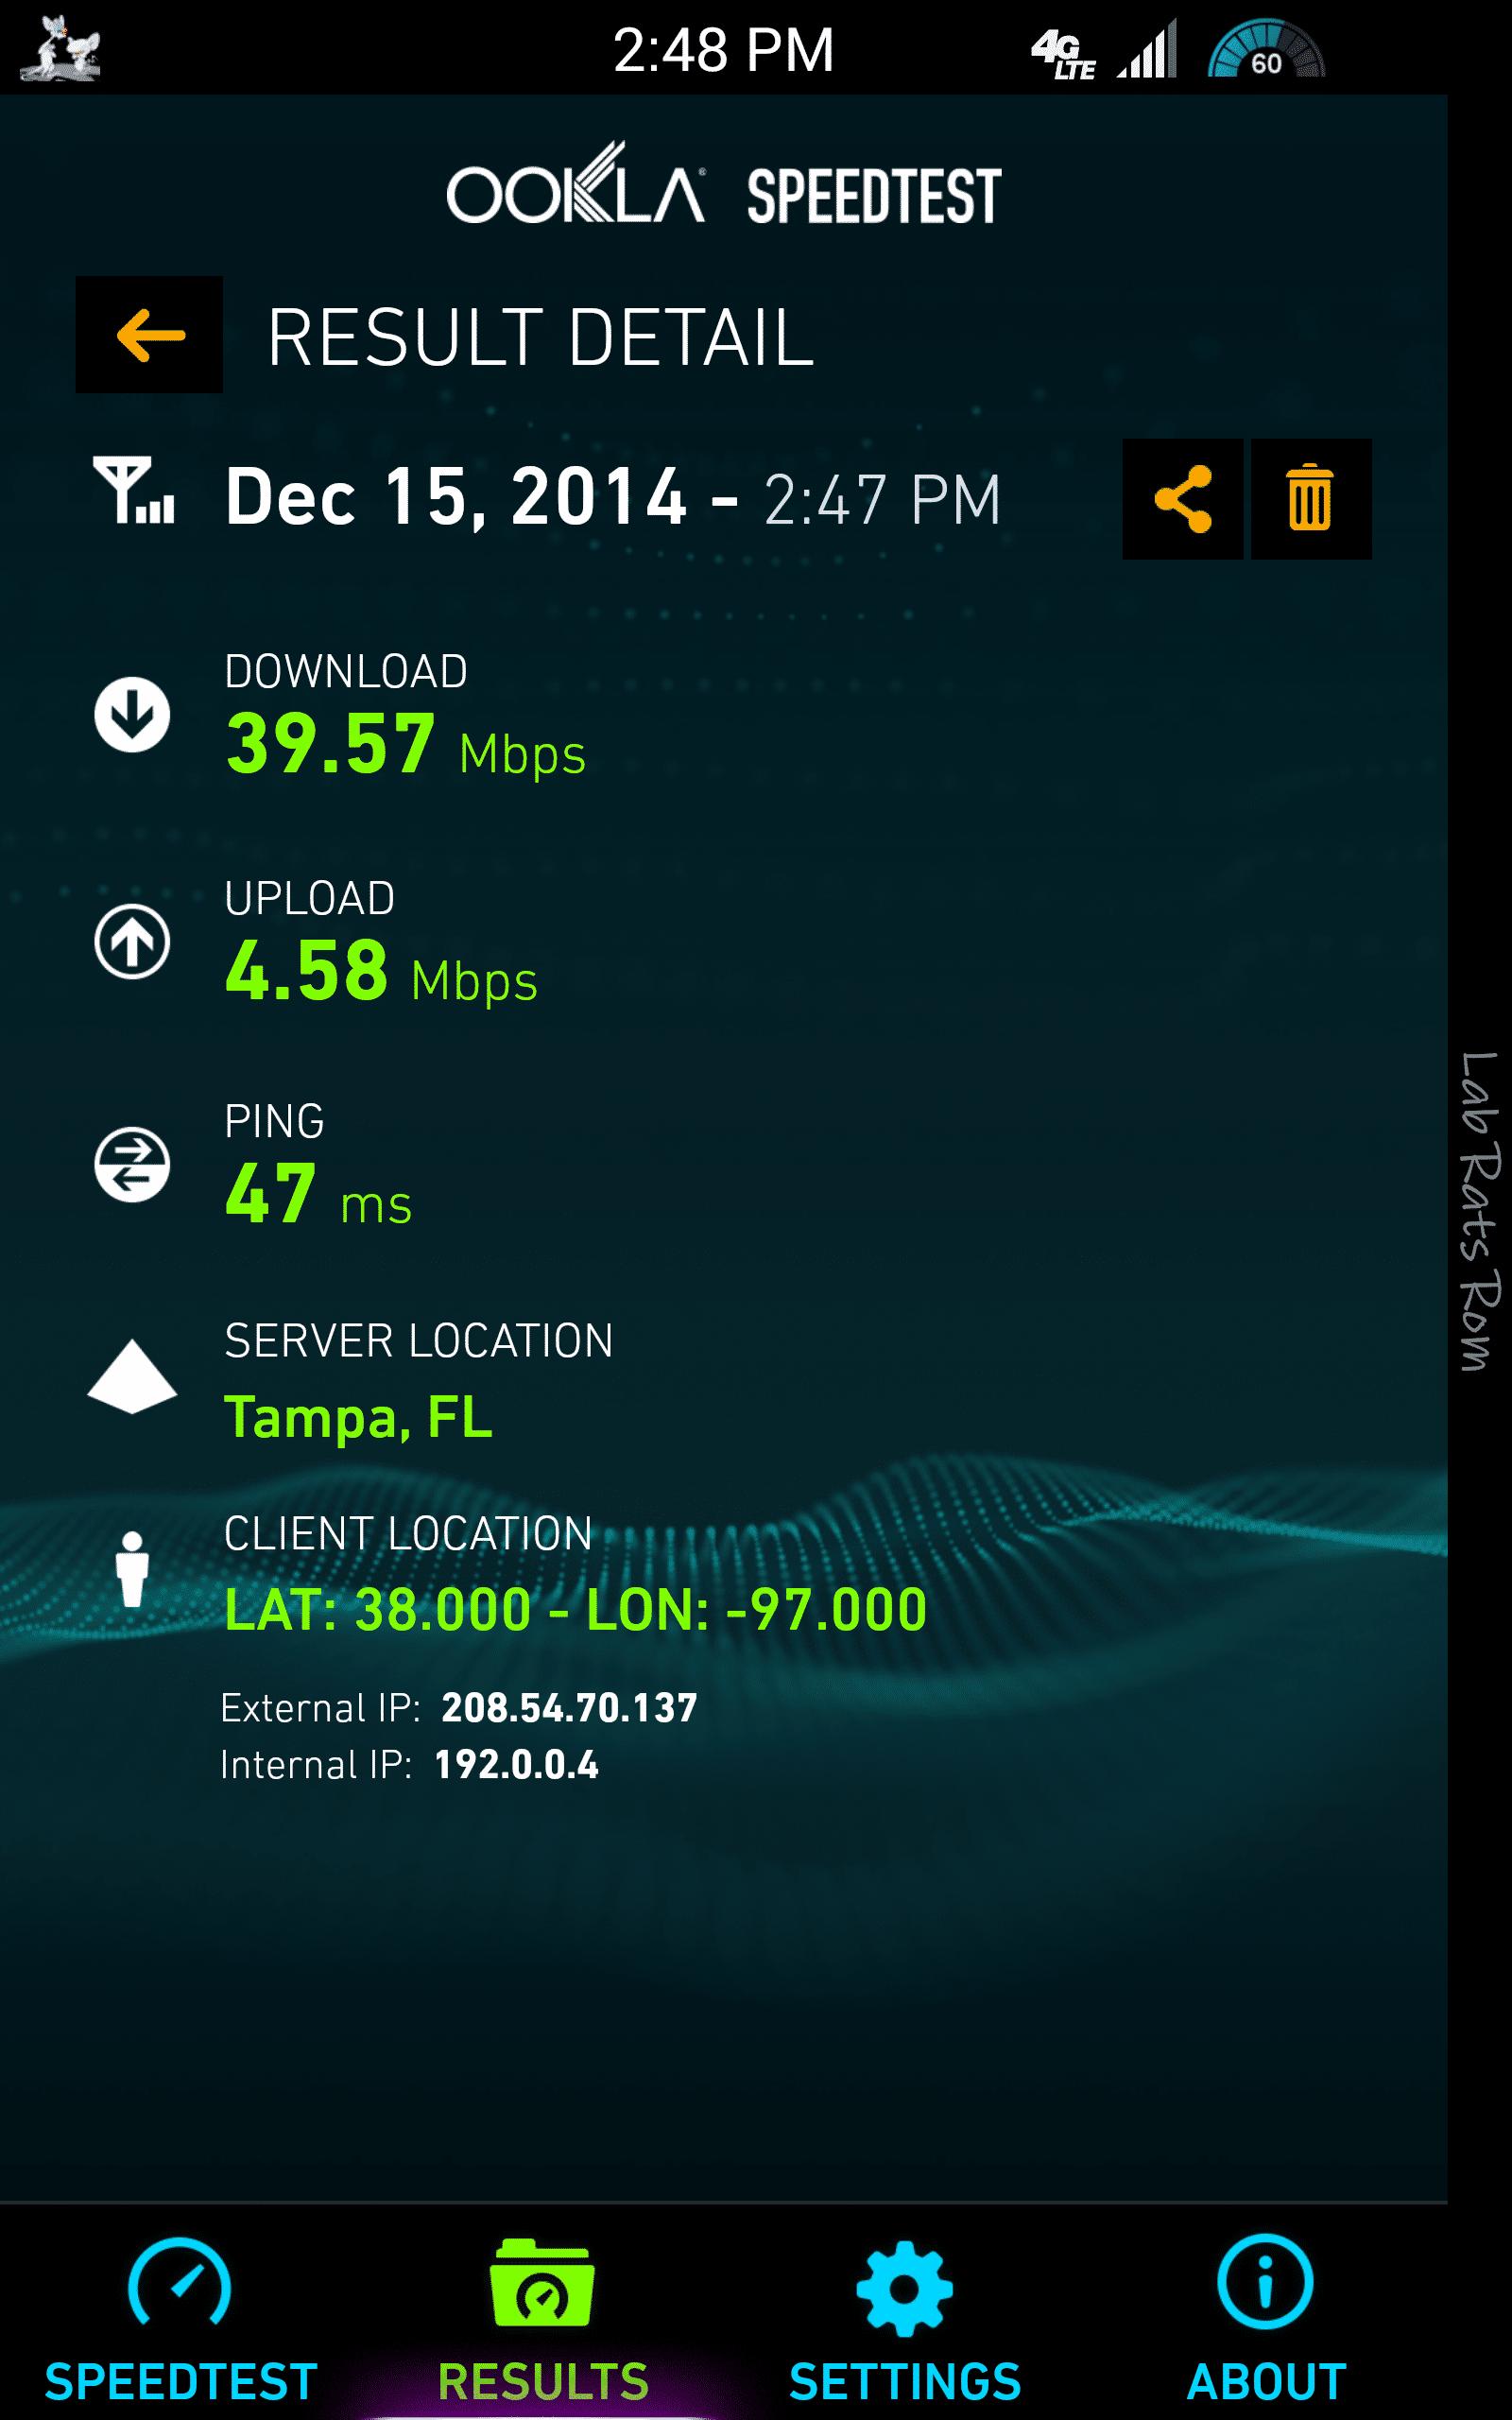 Screenshot_2014-12-15-14-48-48.png